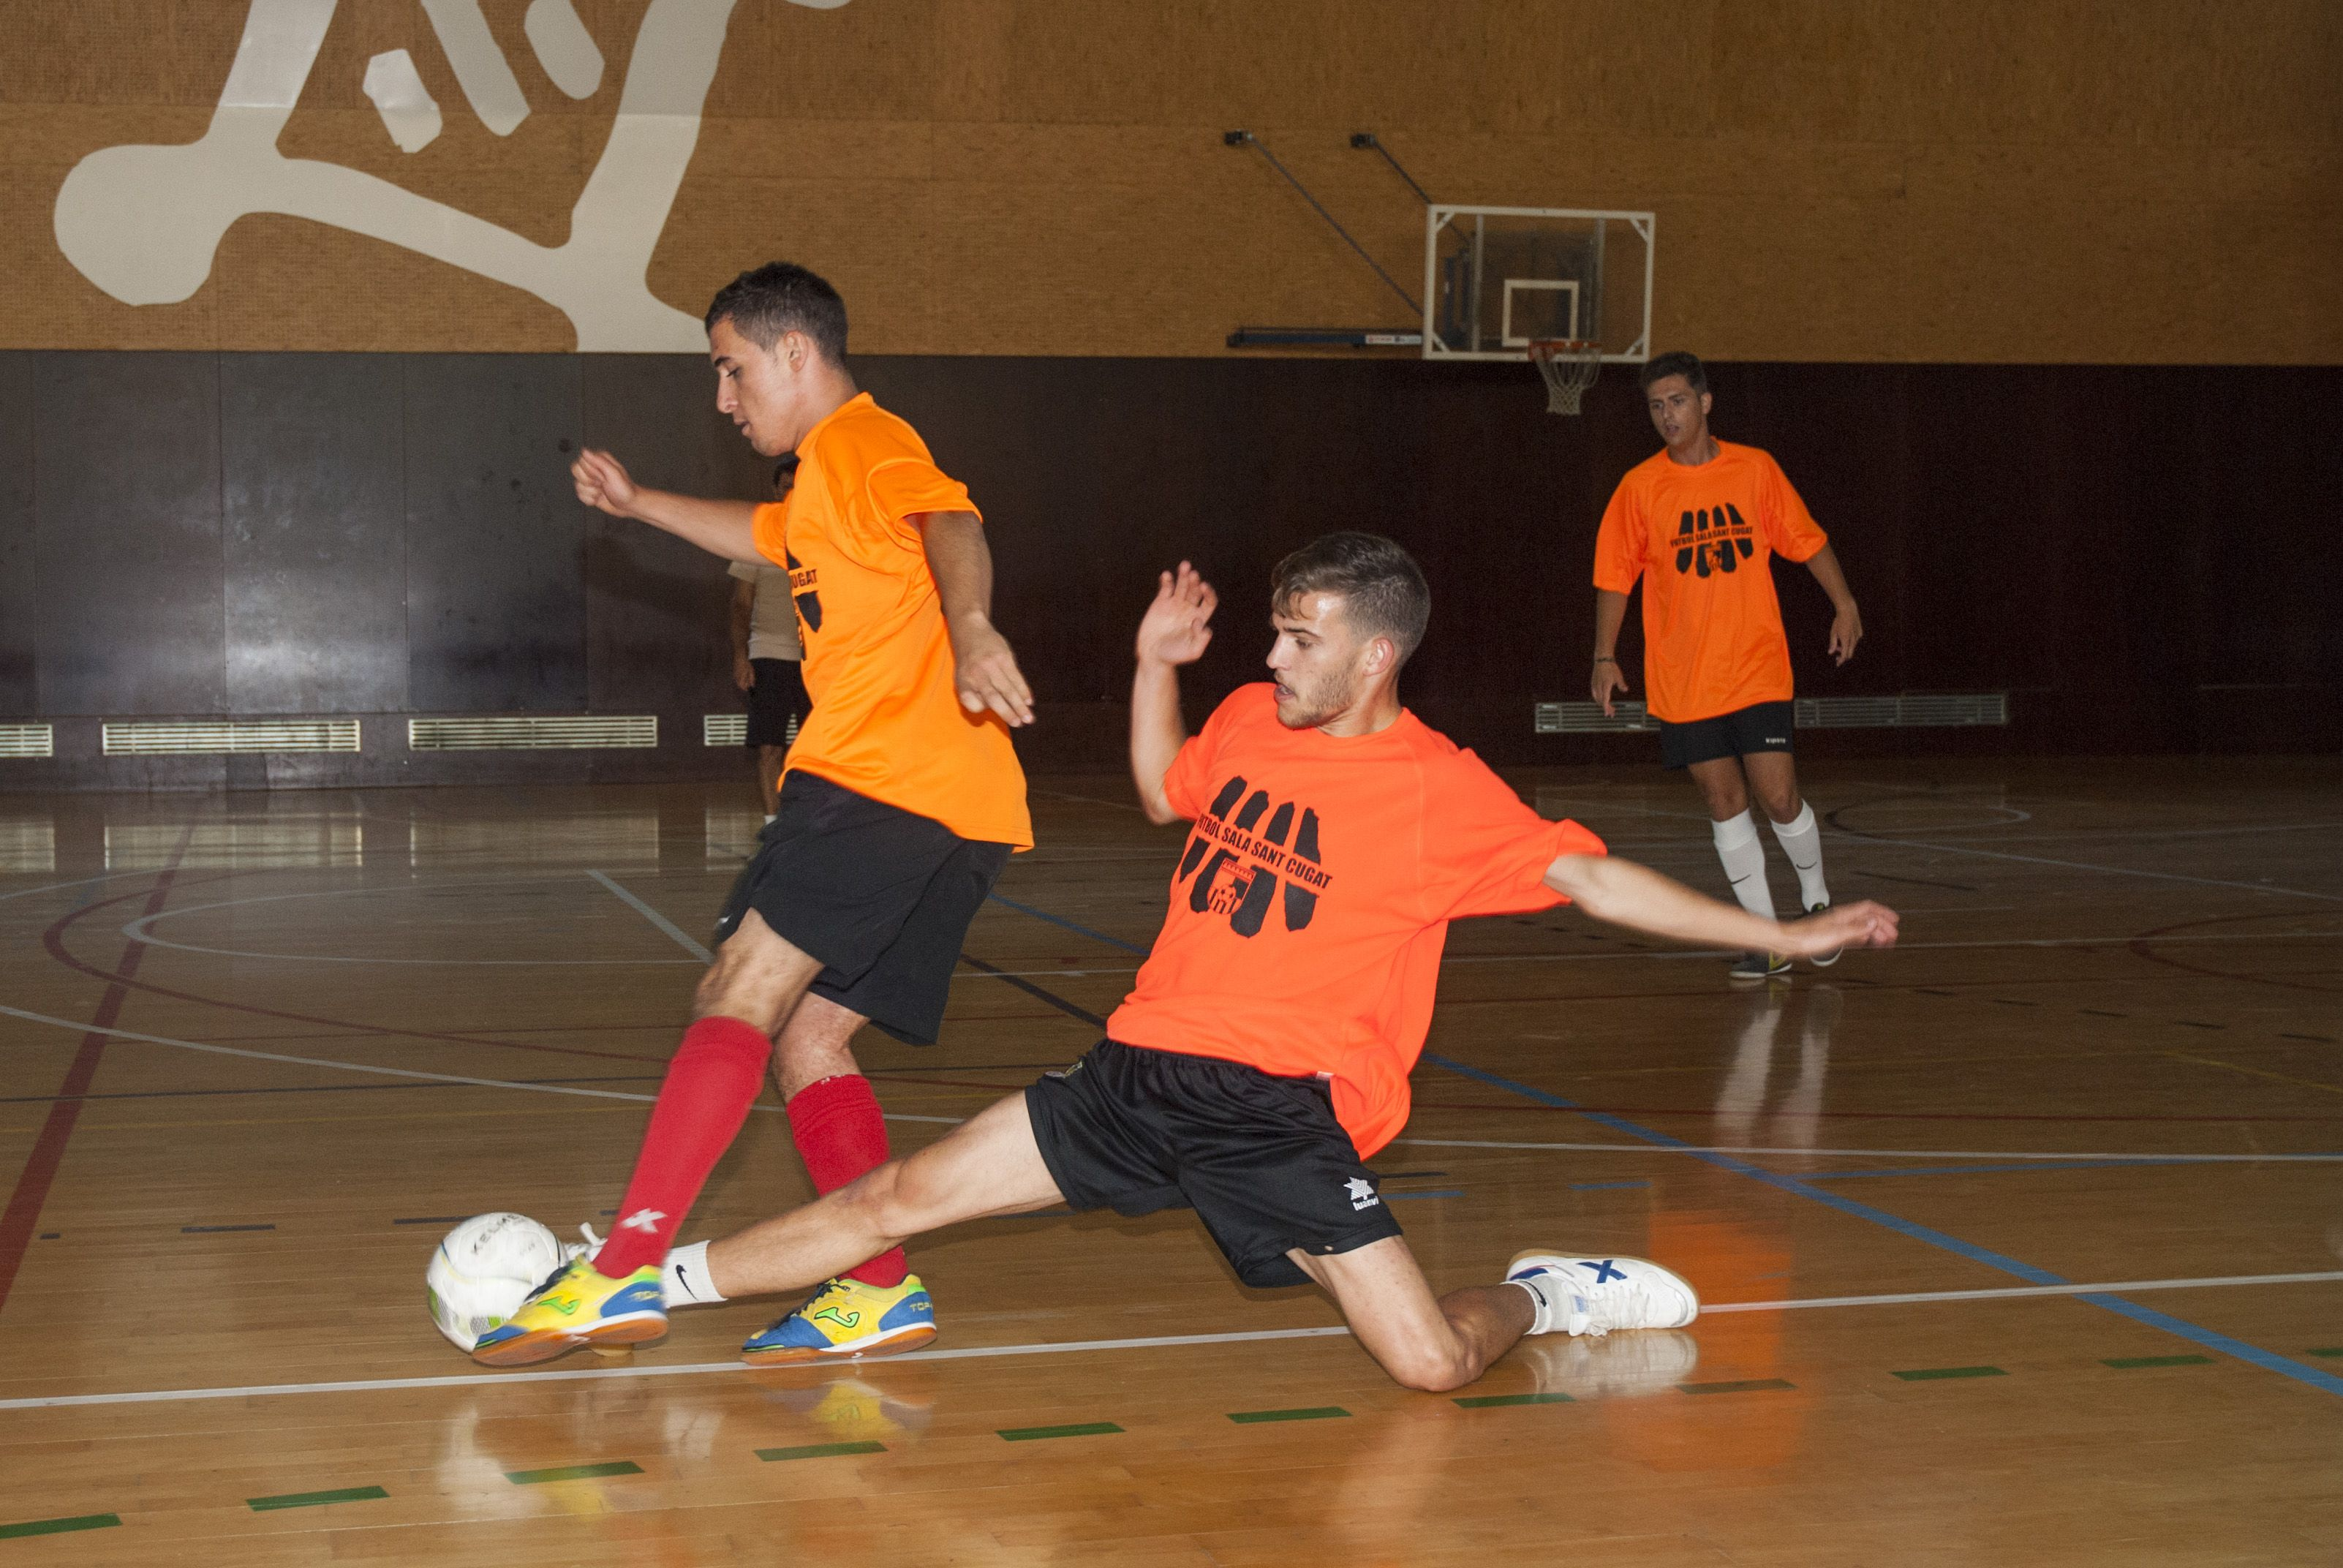 16 Hores de Fútbol Sala, ZEM Rambla del Celler. FOTO: Aïda Sotelo